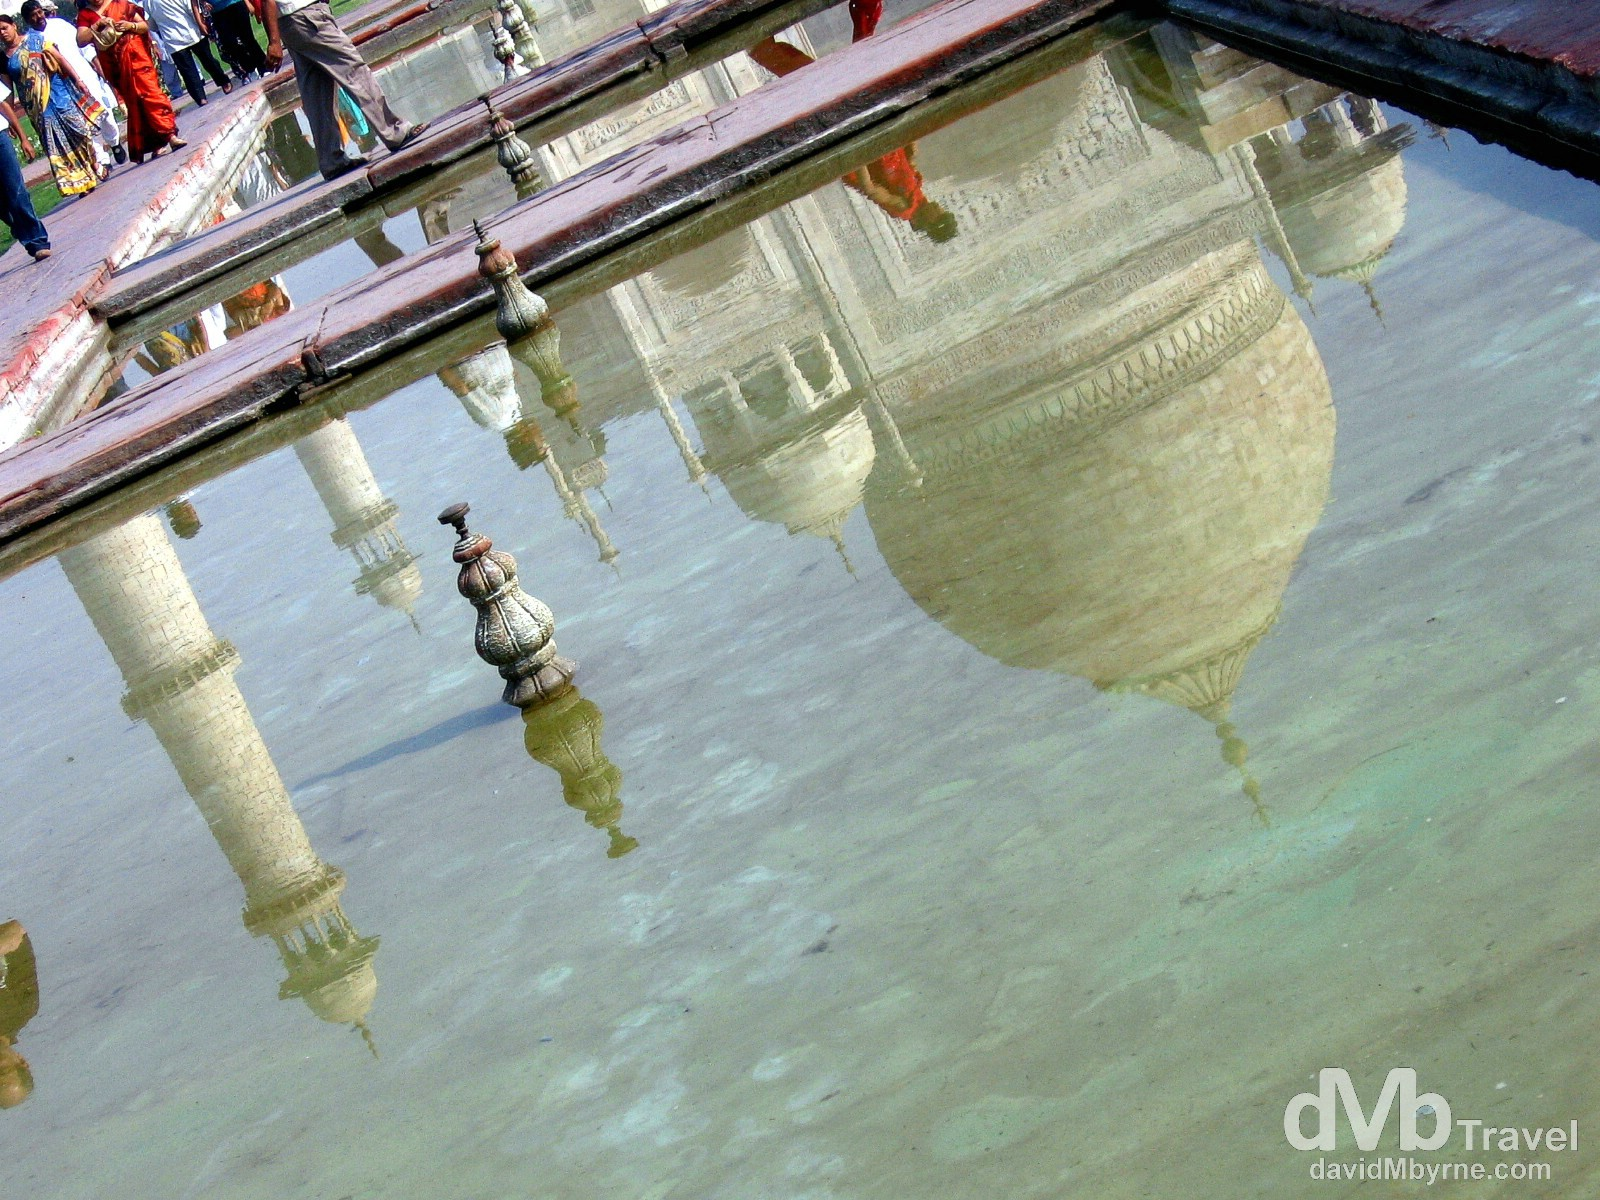 Reflections in the pool fronting the Taj Mahal, Agra, Uttar Pradesh, India. March 25, 2008.